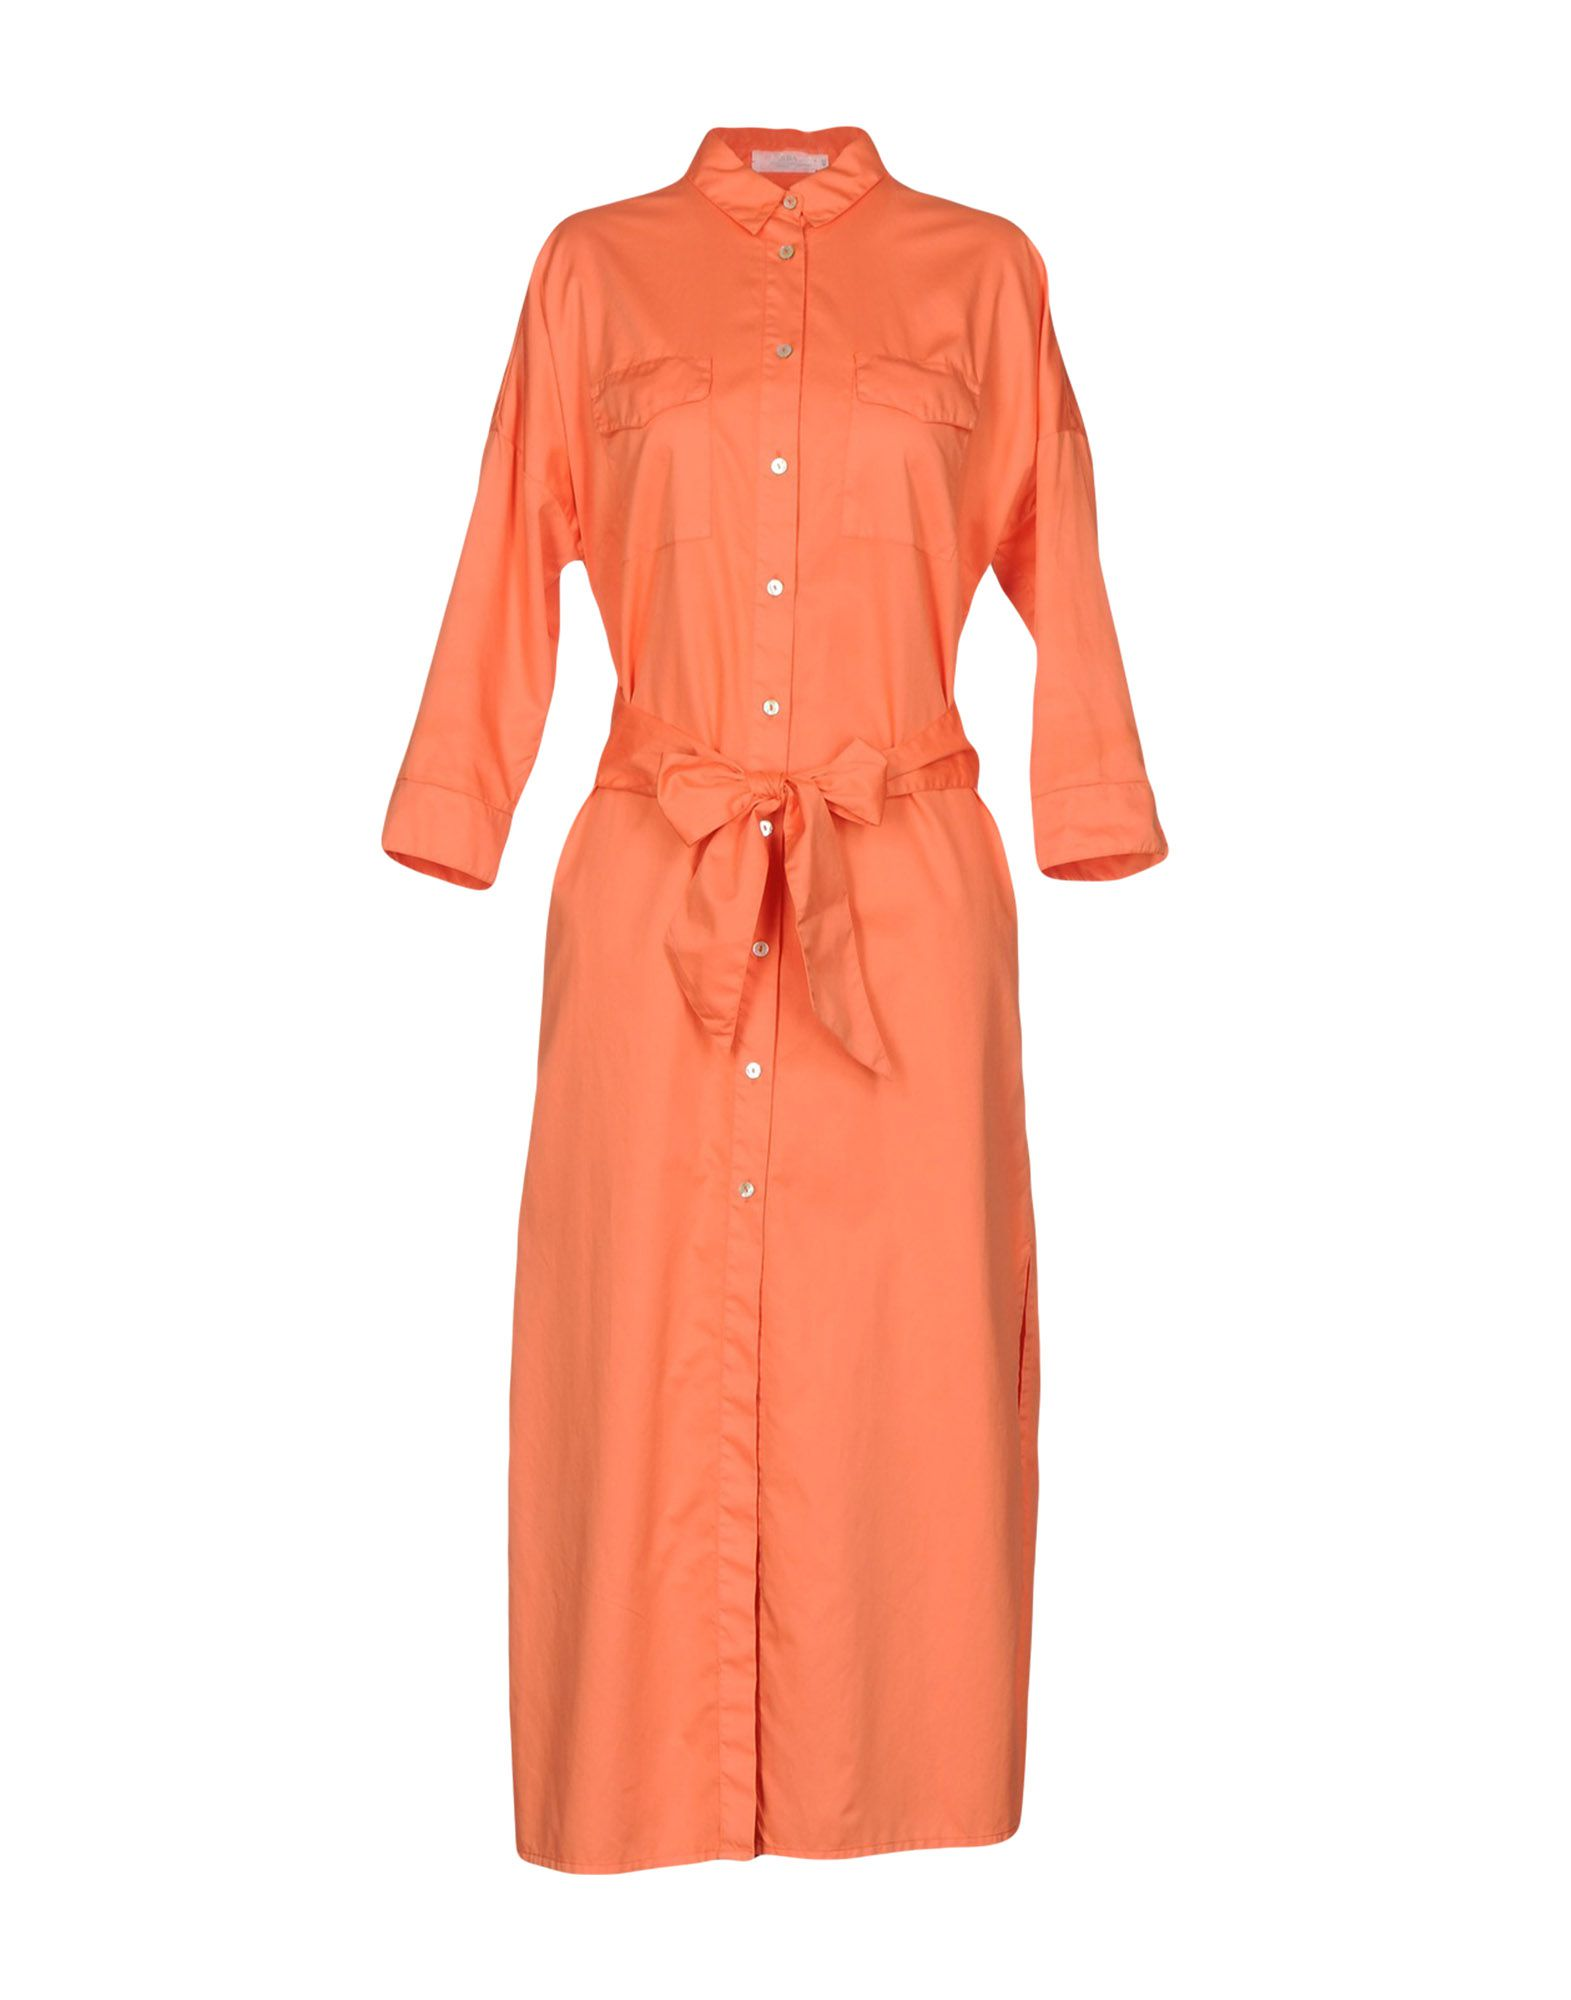 BARBA Napoli Платье длиной 3/4 lisa corti платье длиной 3 4